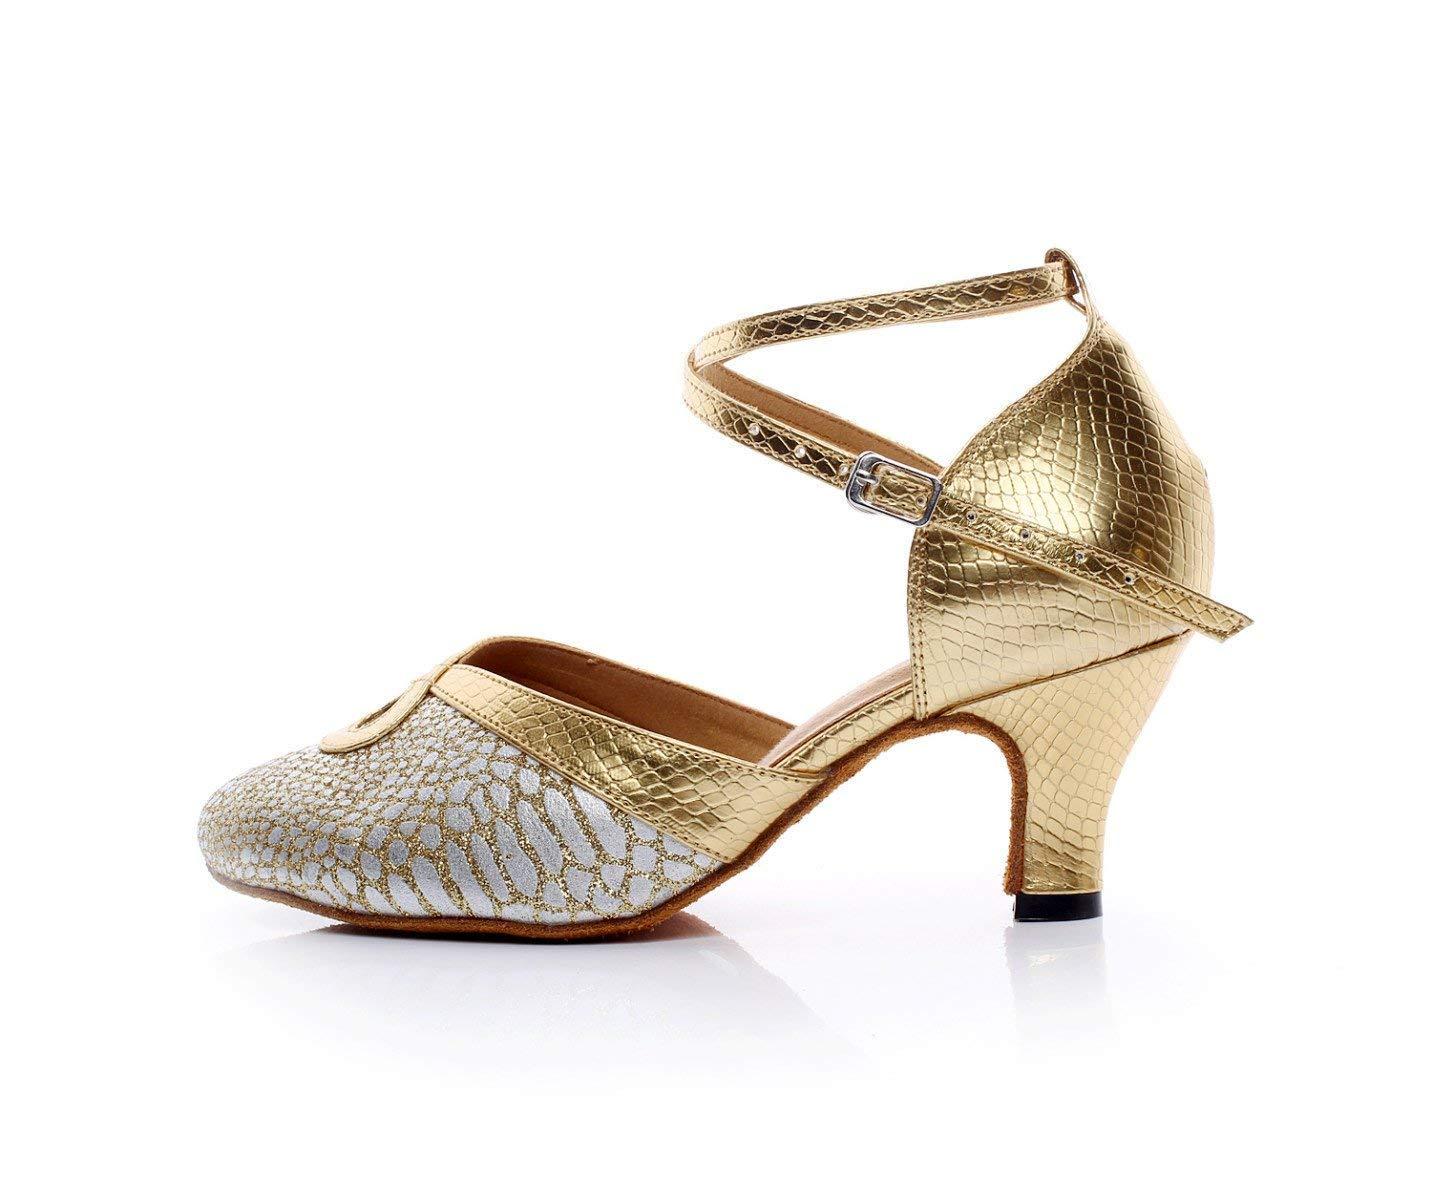 Yingsssq Damen Leder Leder Leder Spitz Kitten Ferse Latin Ballroom Dance Schuhe Salsa Tango Chacha Samba Modern Jazz Schuhe Gelb-heeled6cm-UK5.5   EU38   Our39 e617ca